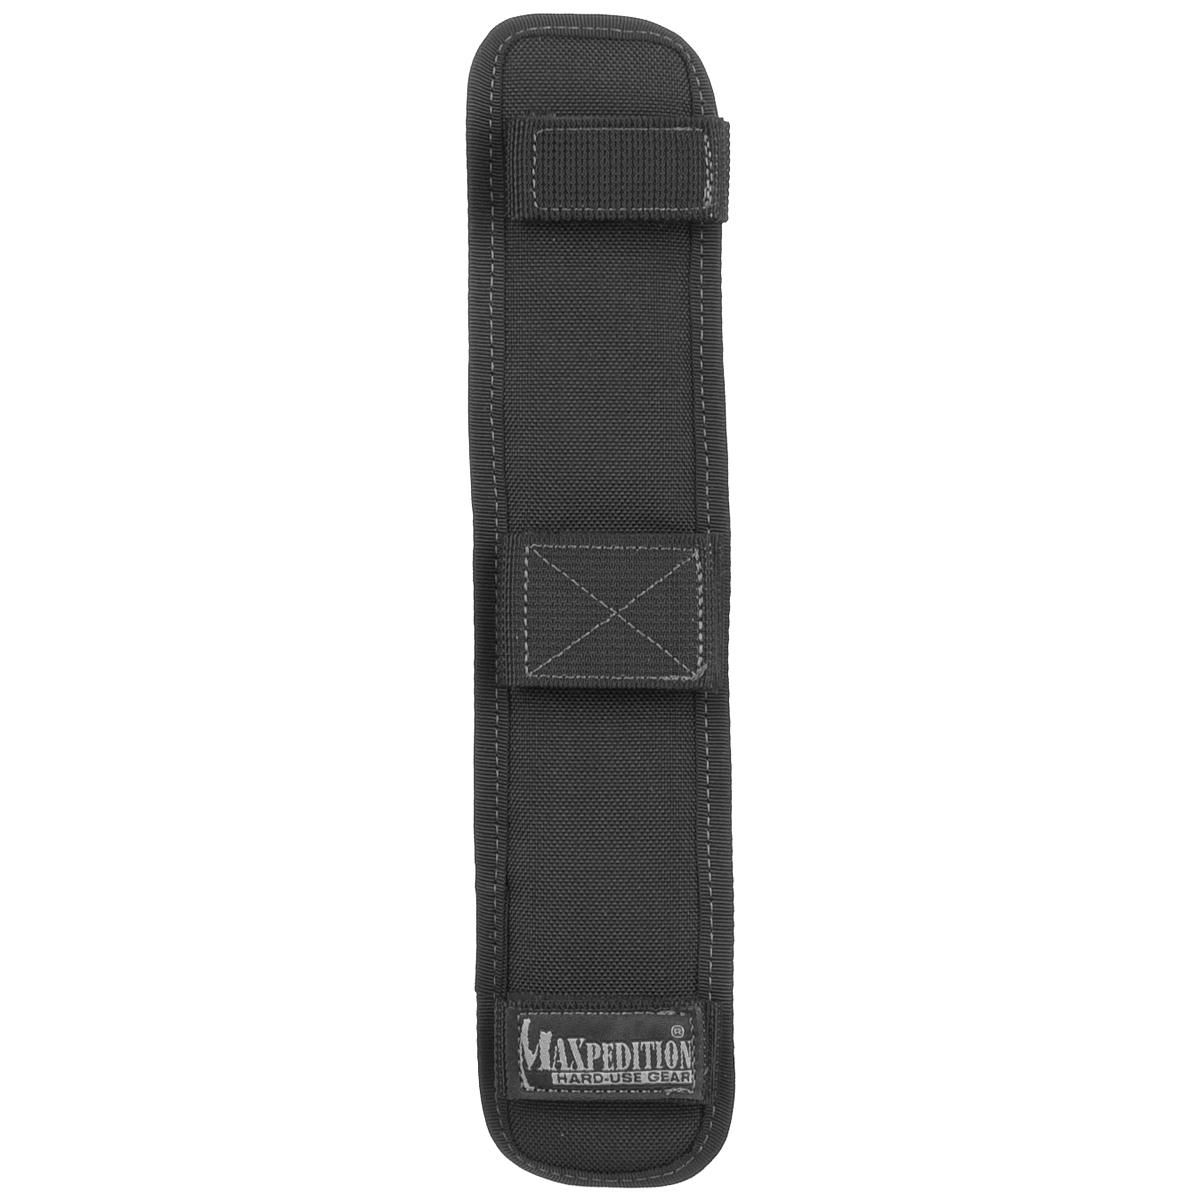 "Maxpedition 1.5/"" Padded Shoulder Pad Non-Slip Bag Strap Wrap Police Black"